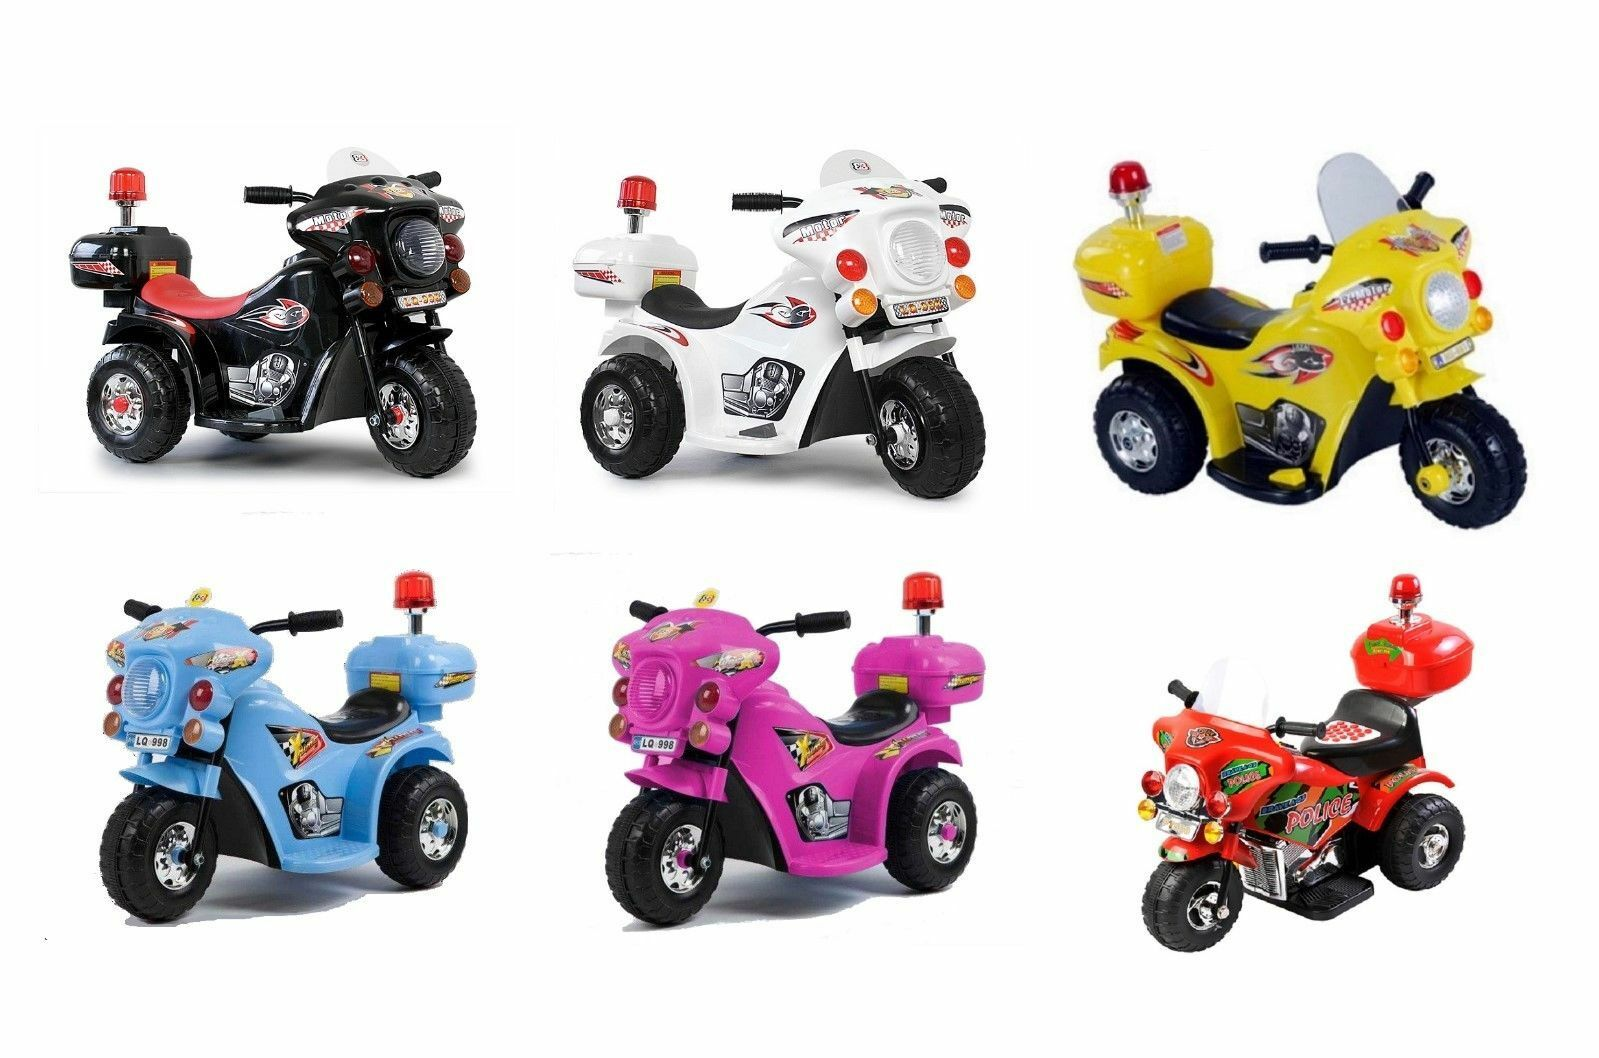 Kindermotorrad Elektromotorrad Polizei Kinder Elektro Motorrad mehrfarbig NEU